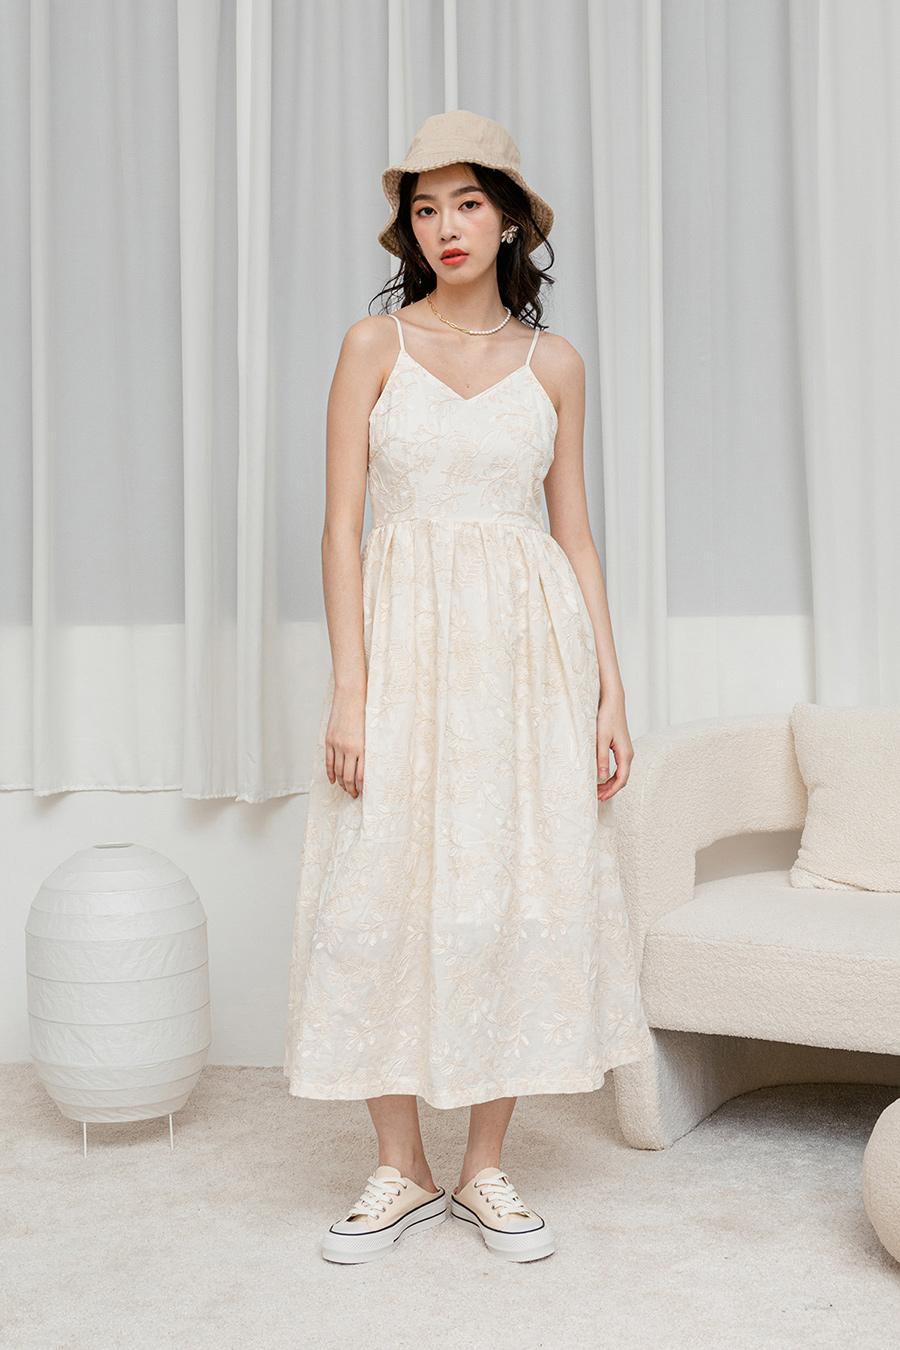 AUBREY DRESS - NATURE WANDERER [BY MODPARADE]